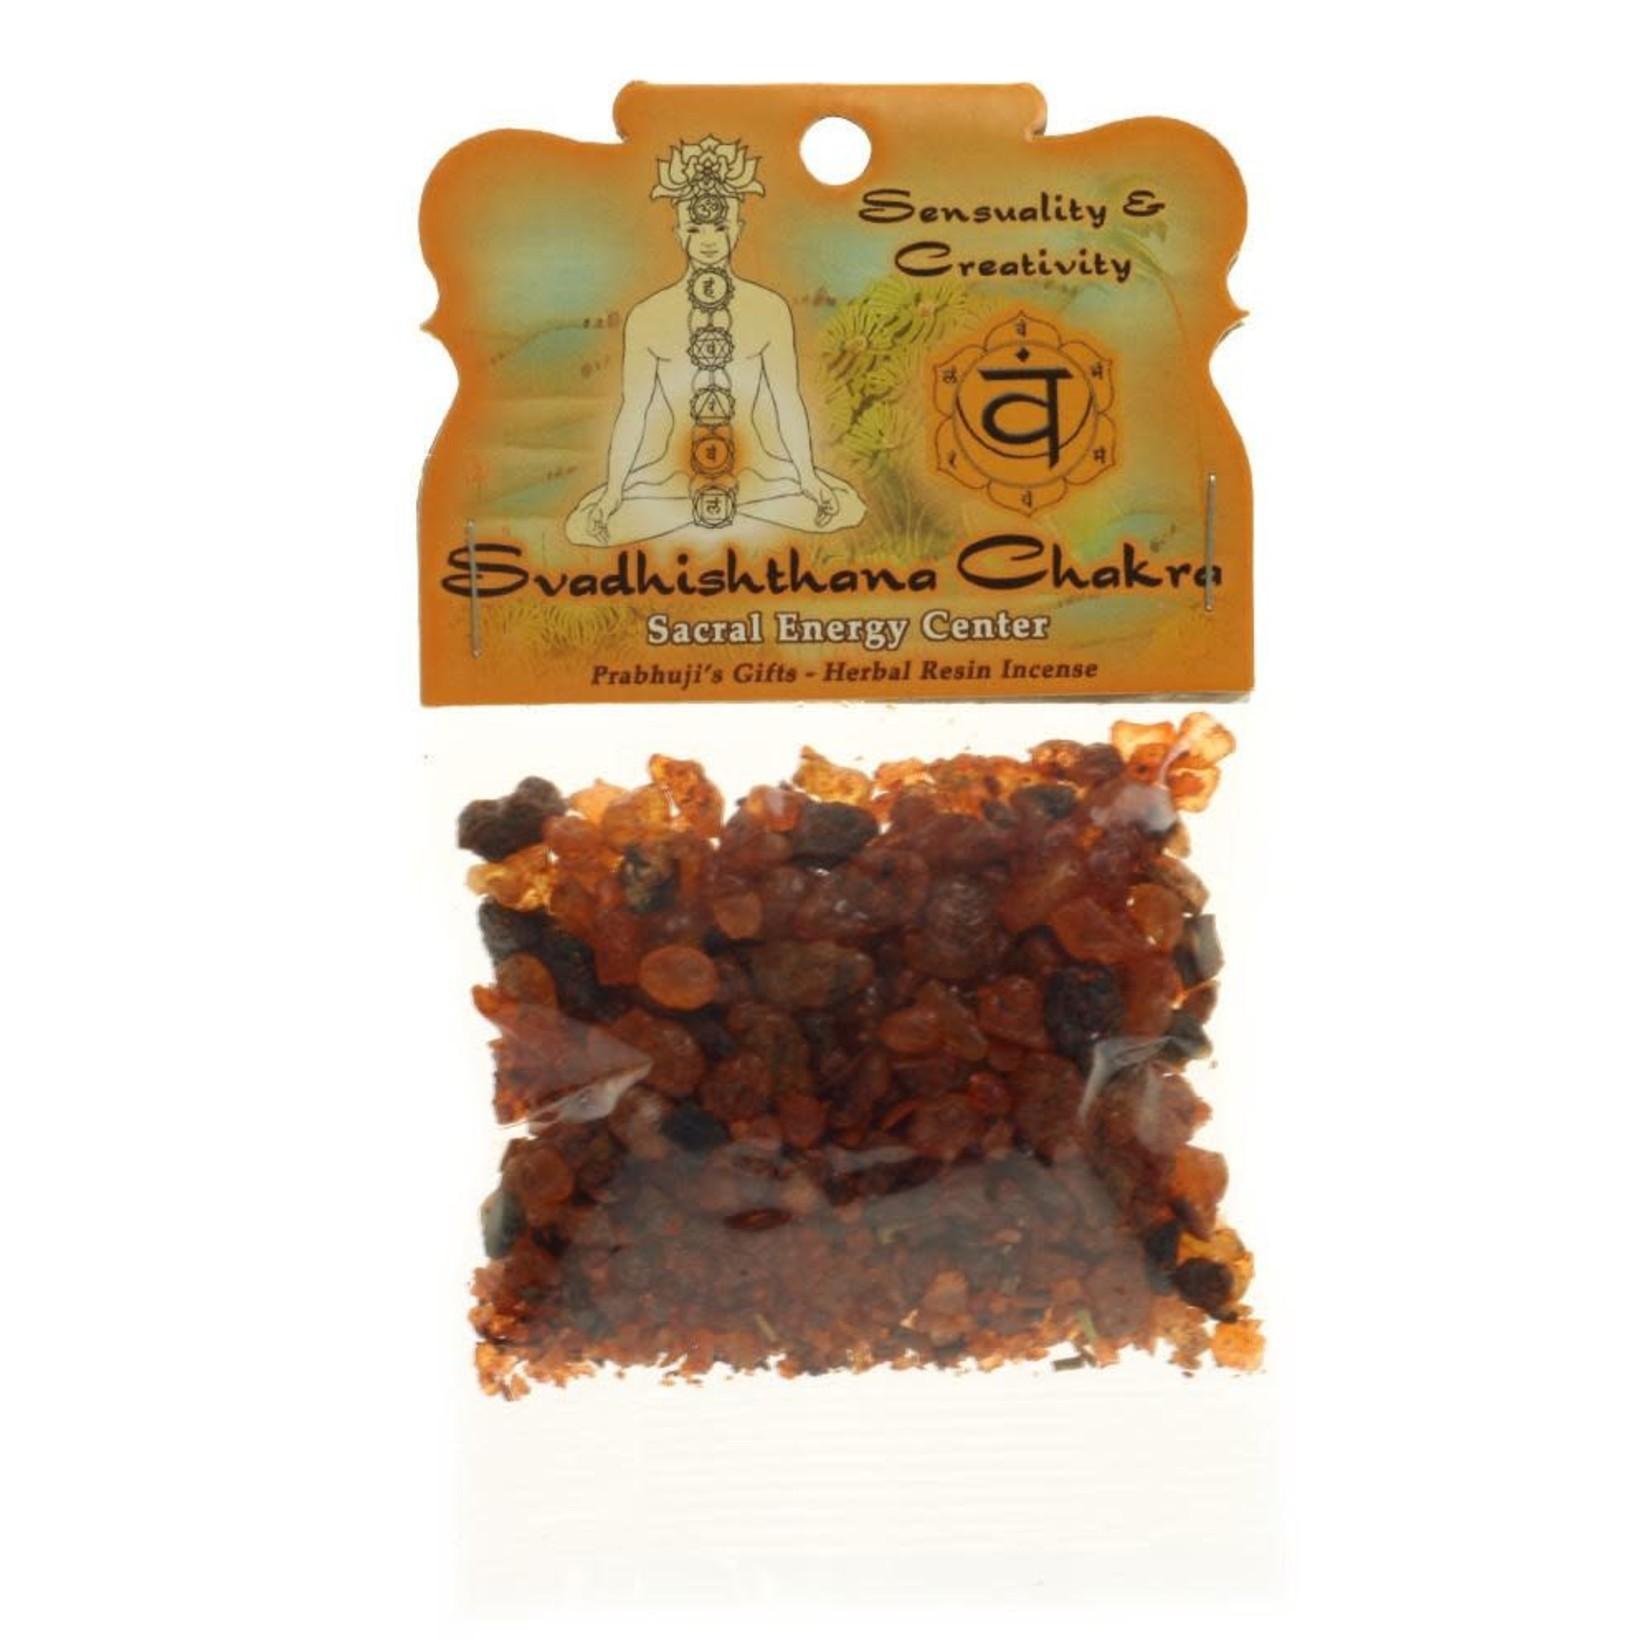 Prabhujis Gifts Sacral Chakra Svadhishtana - Sensuality and Creativity Resin Incense